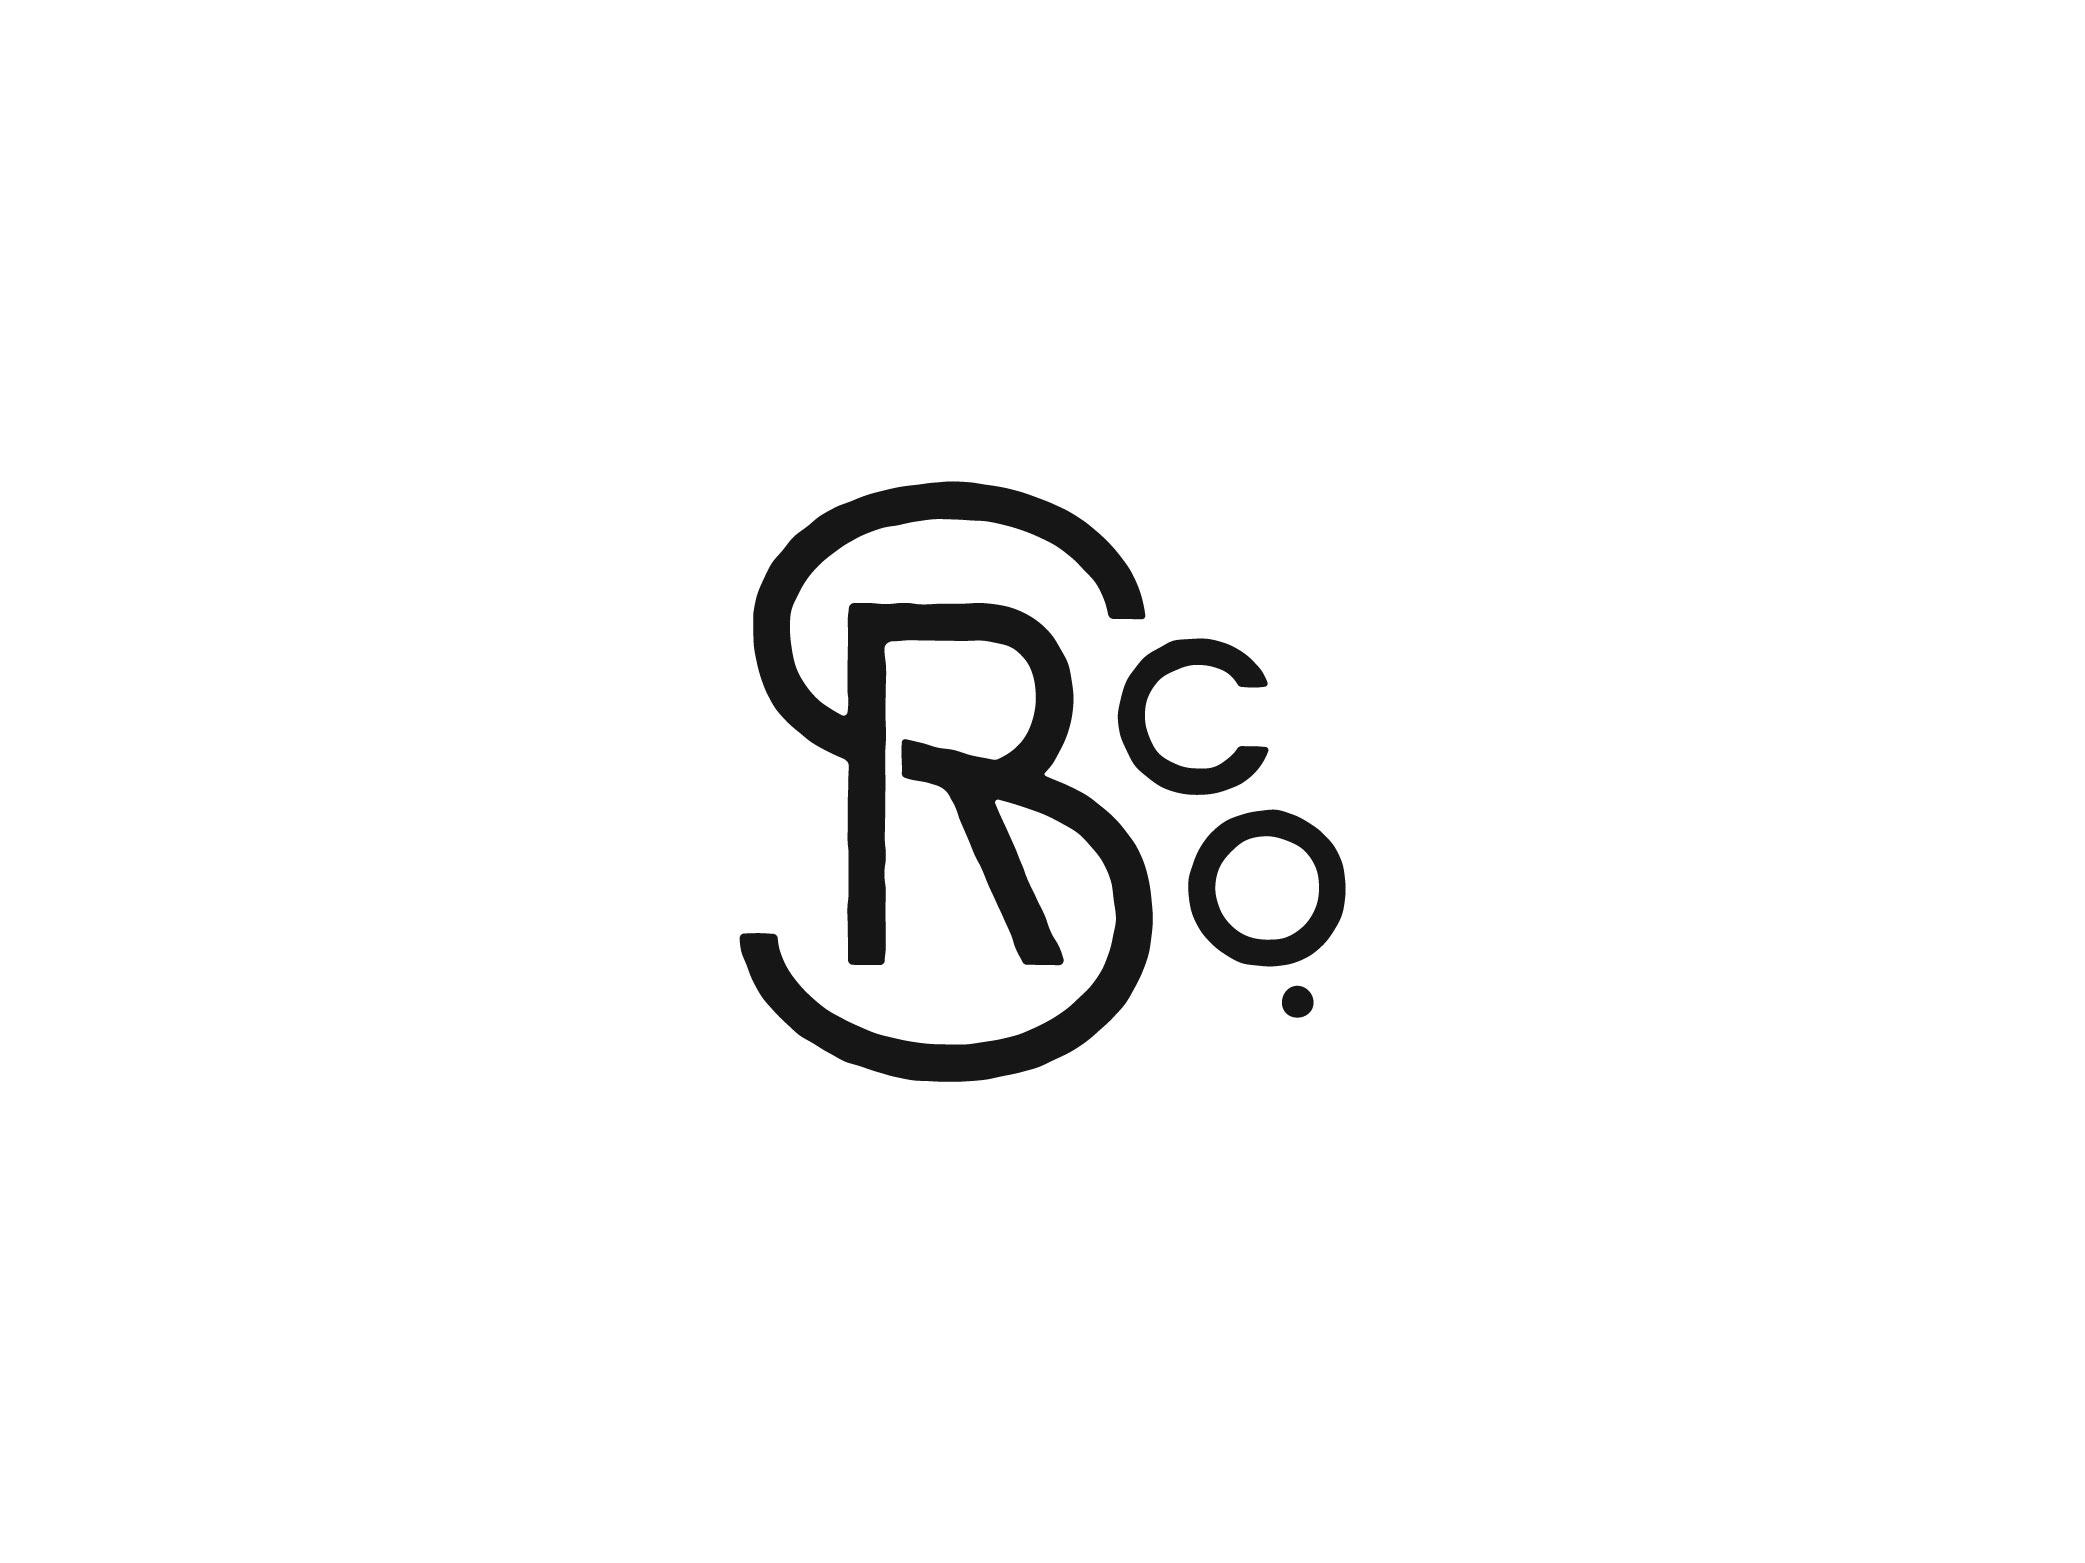 Studio Freight - SR Co Logo